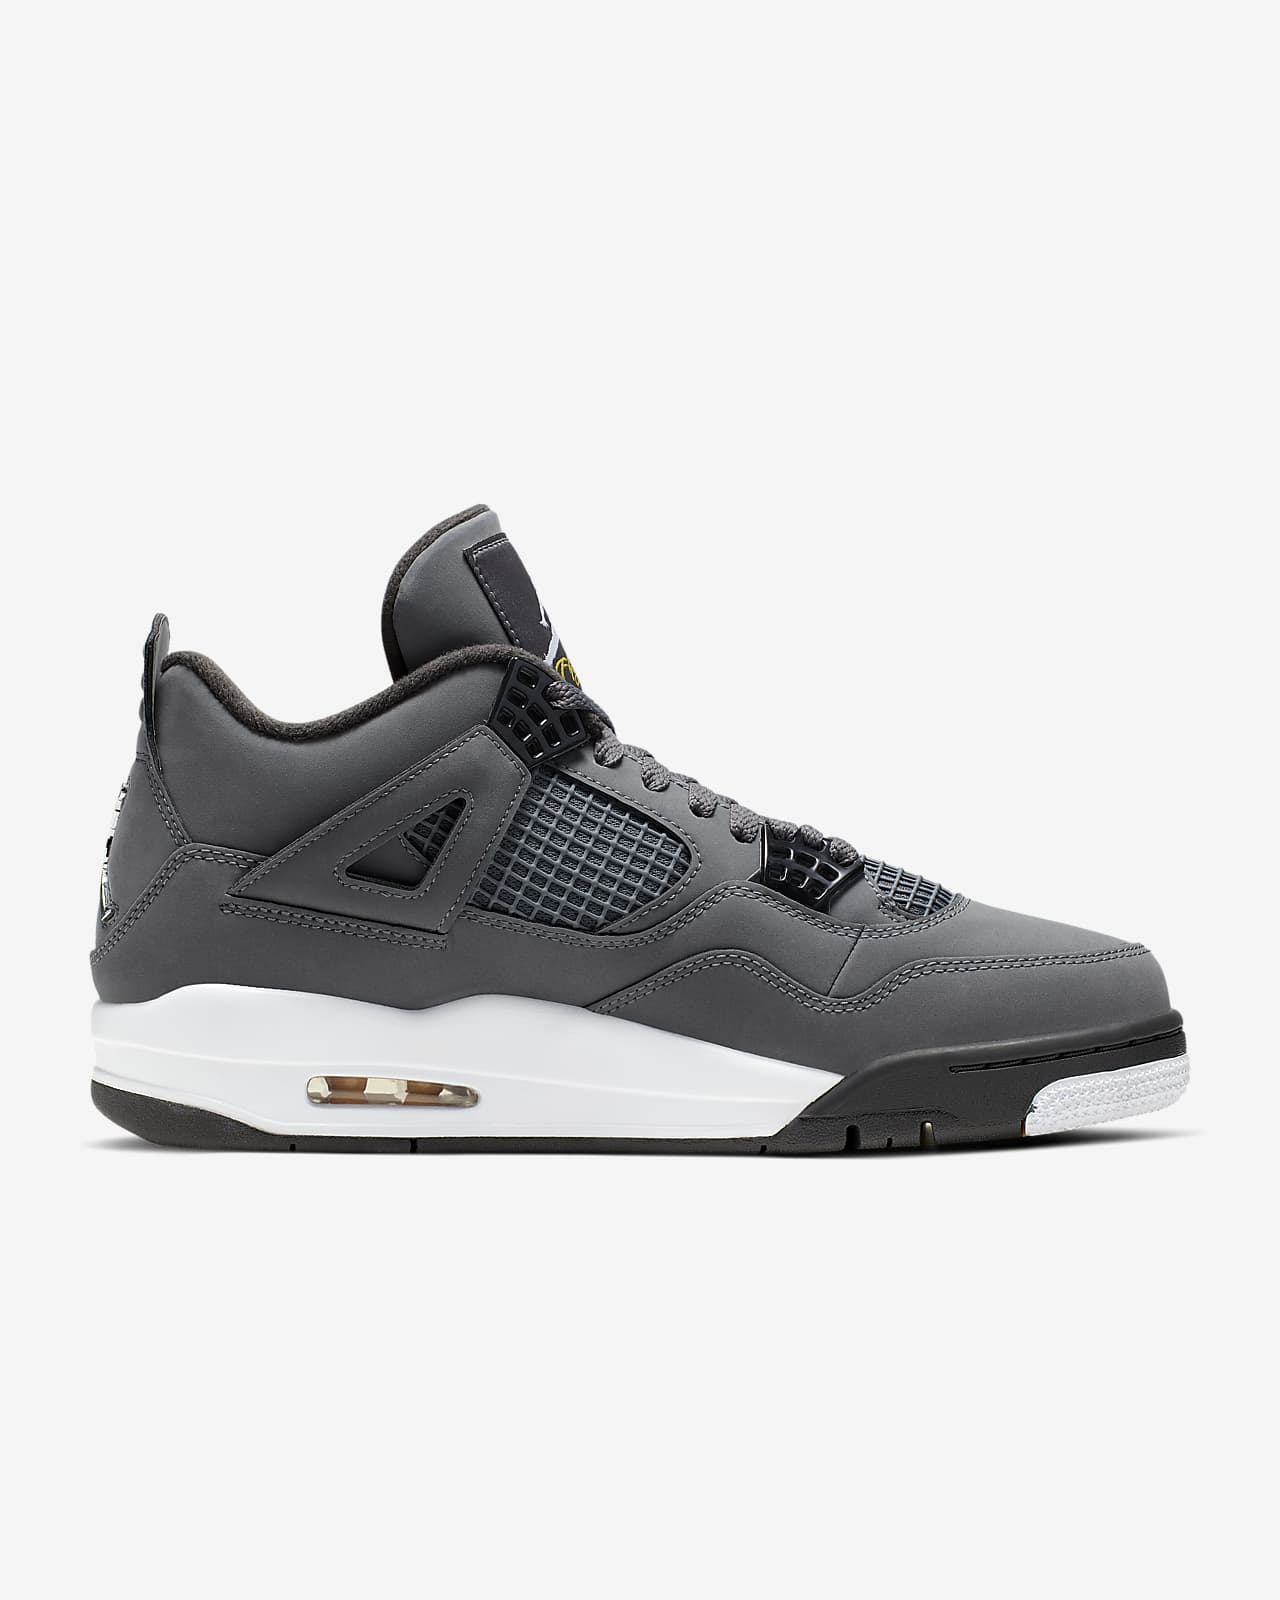 Air Jordan 4 Retro Men's Shoes